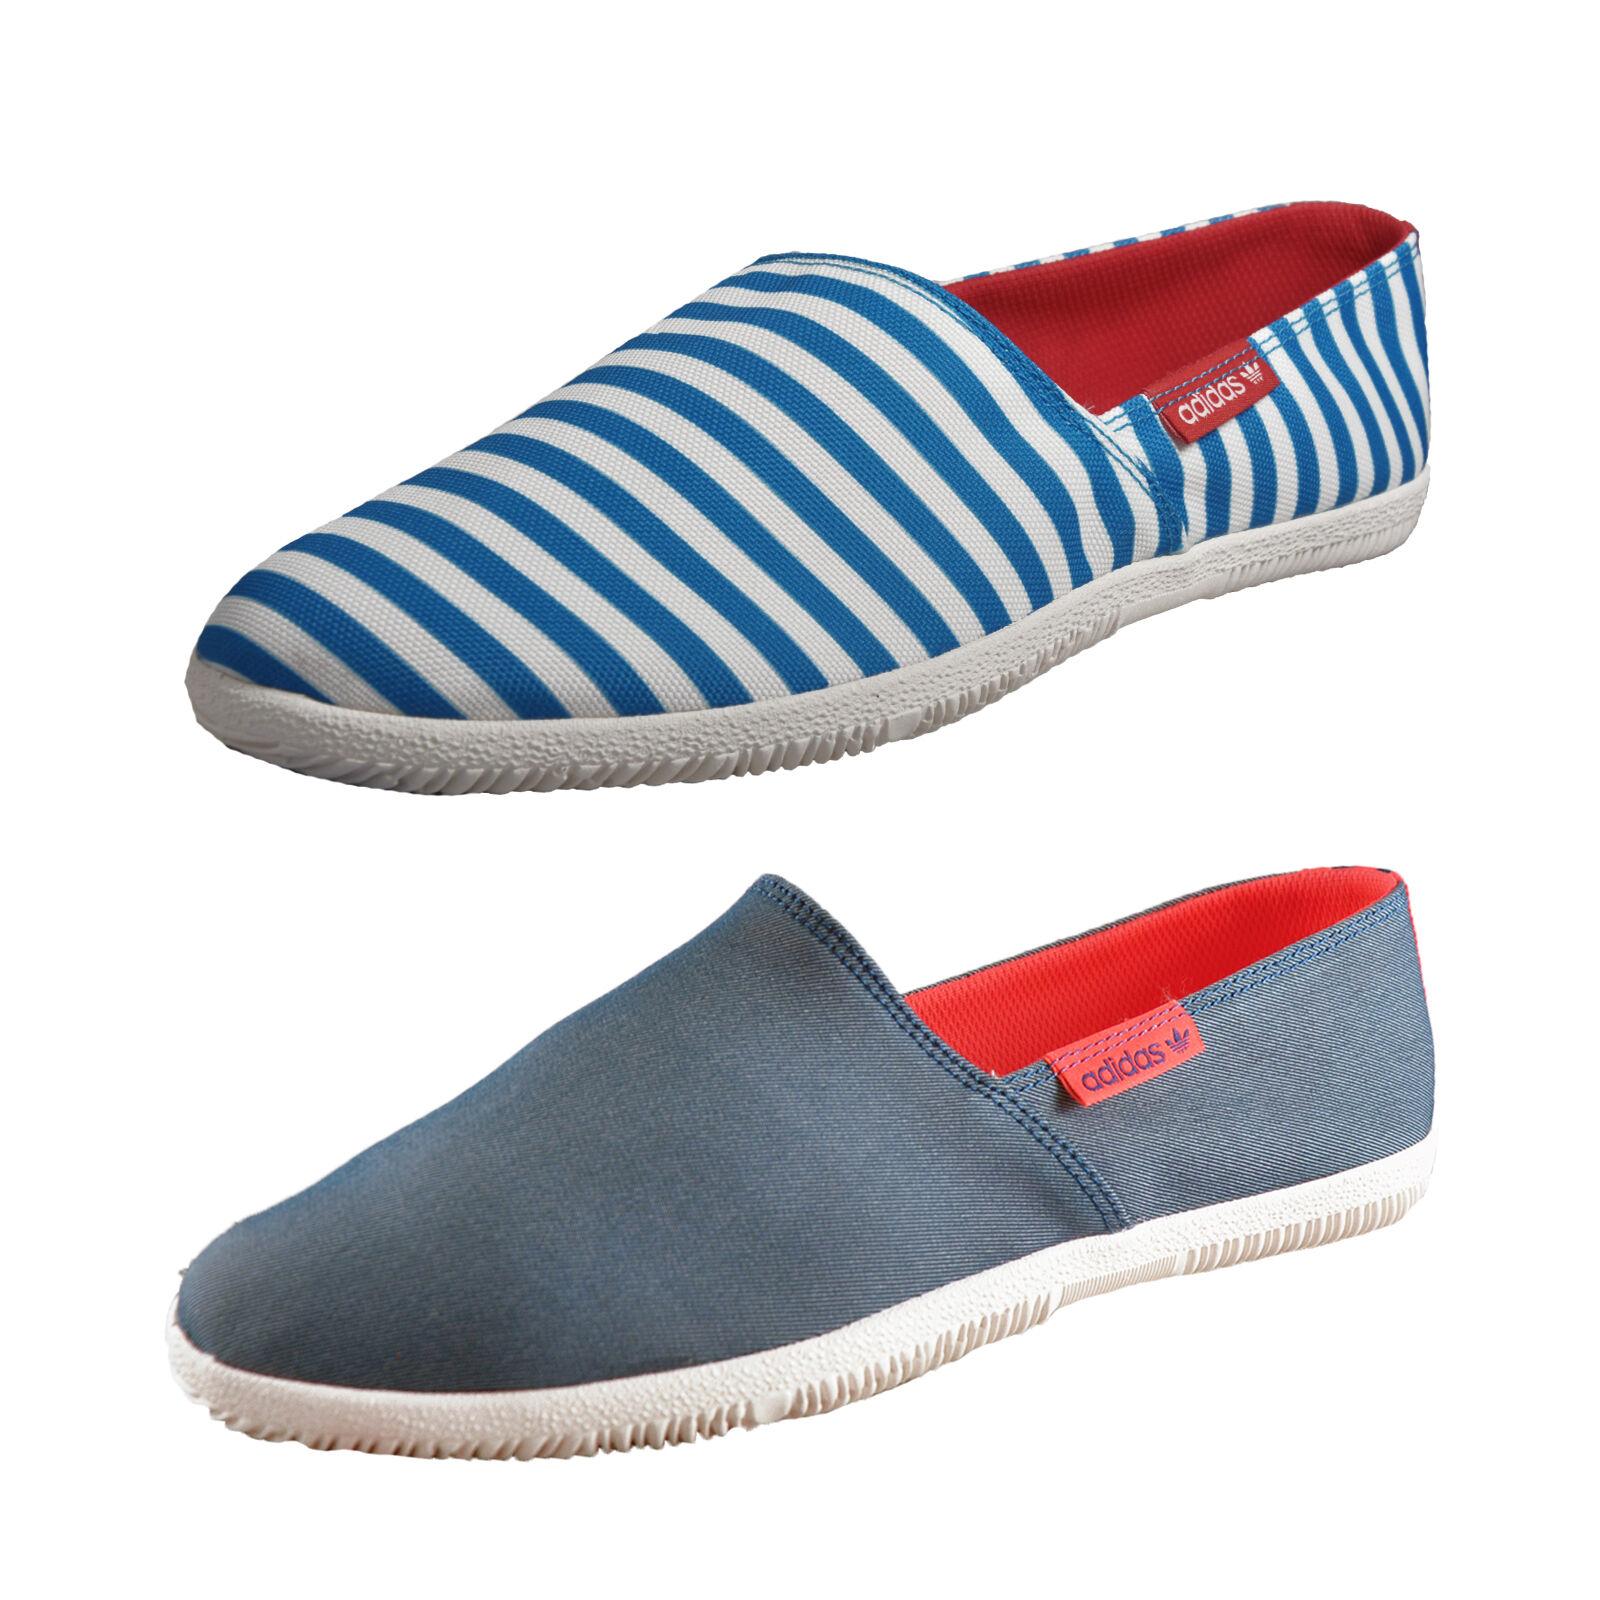 d44f1d8c20f9 Mens Blue Espadrille Canvas adidas Slip on Shoes D65798 Adidrill UK 6.5 for  sale online